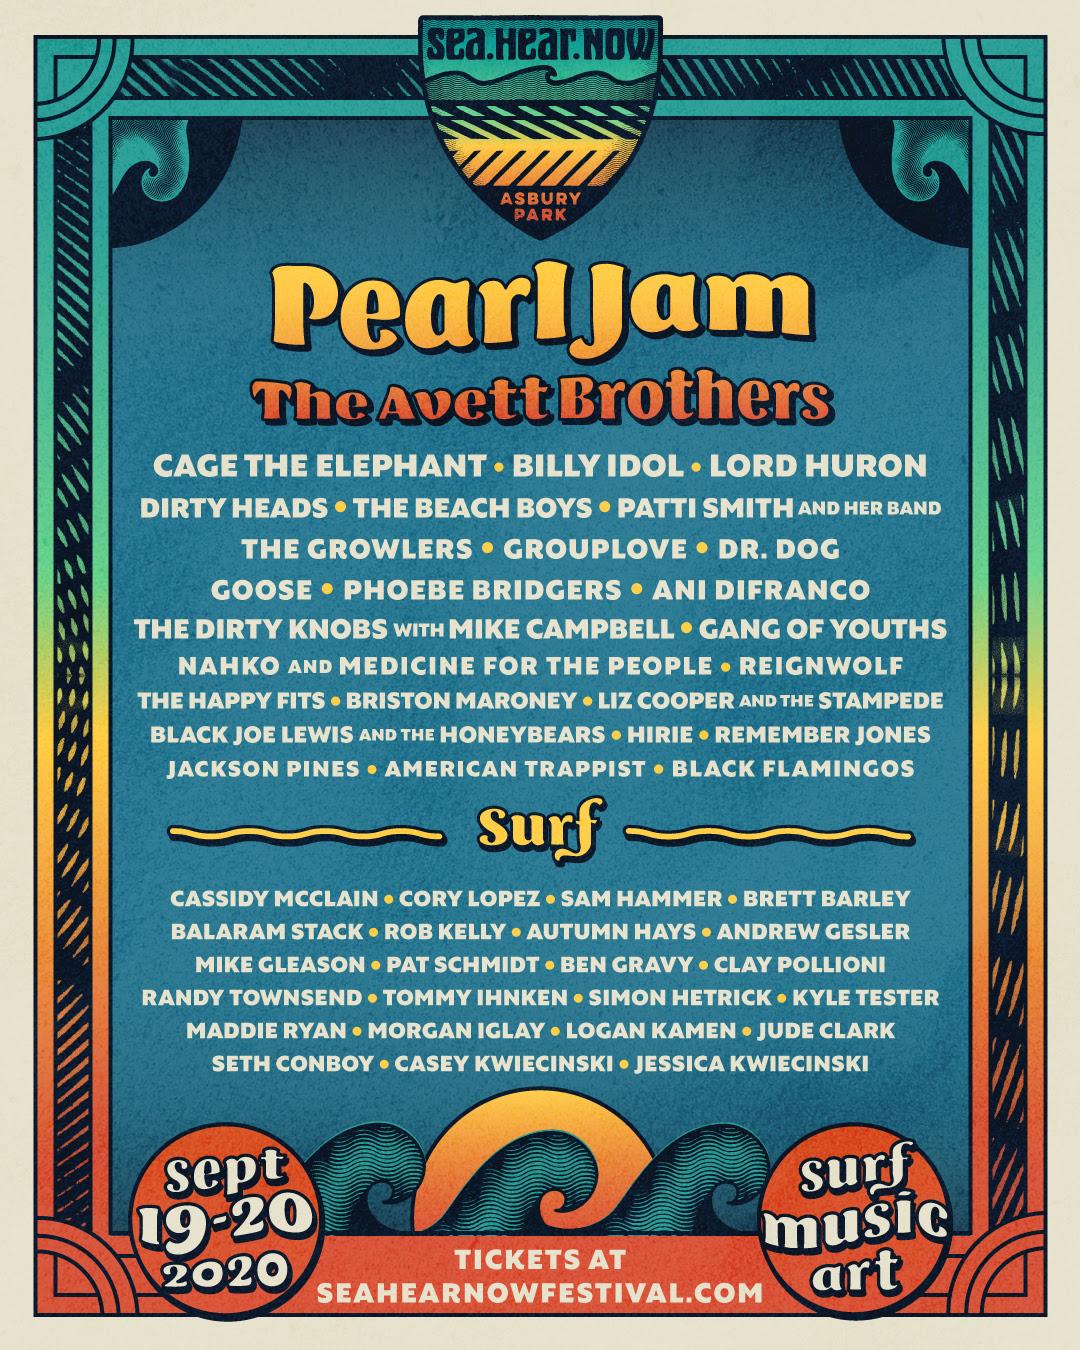 SeaHearNow Festival 2020 lineup